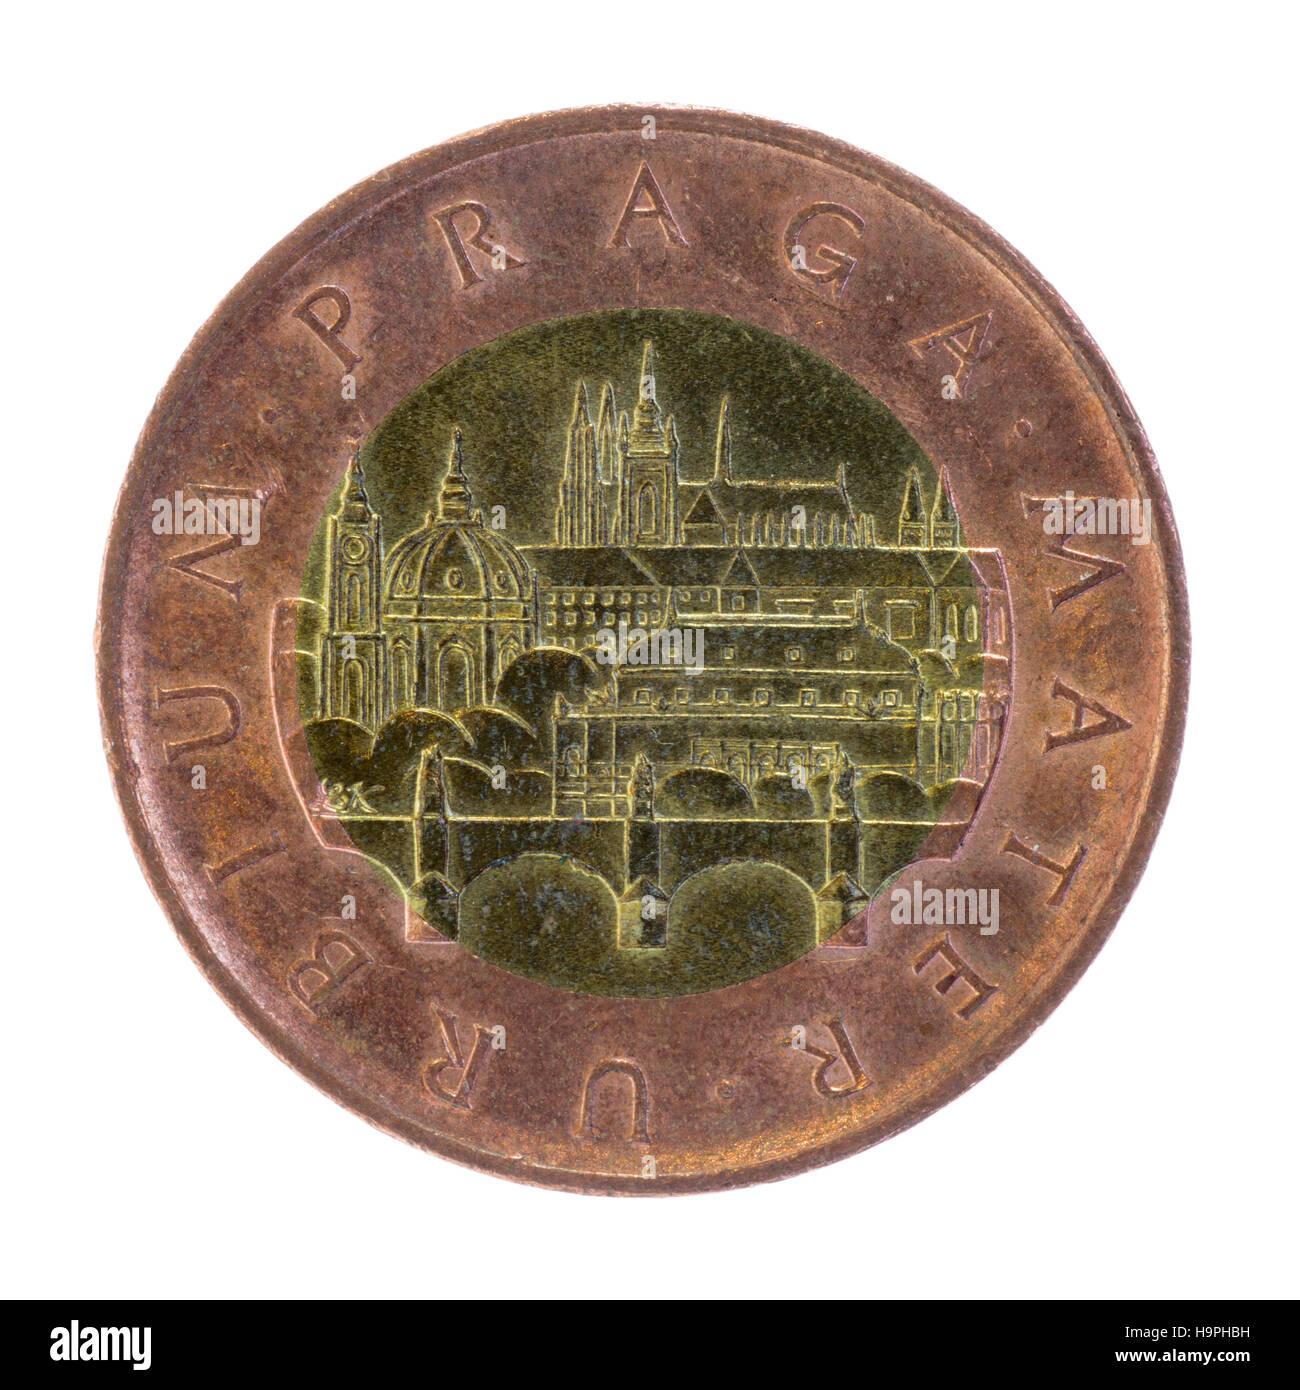 czech 50 koruna coin